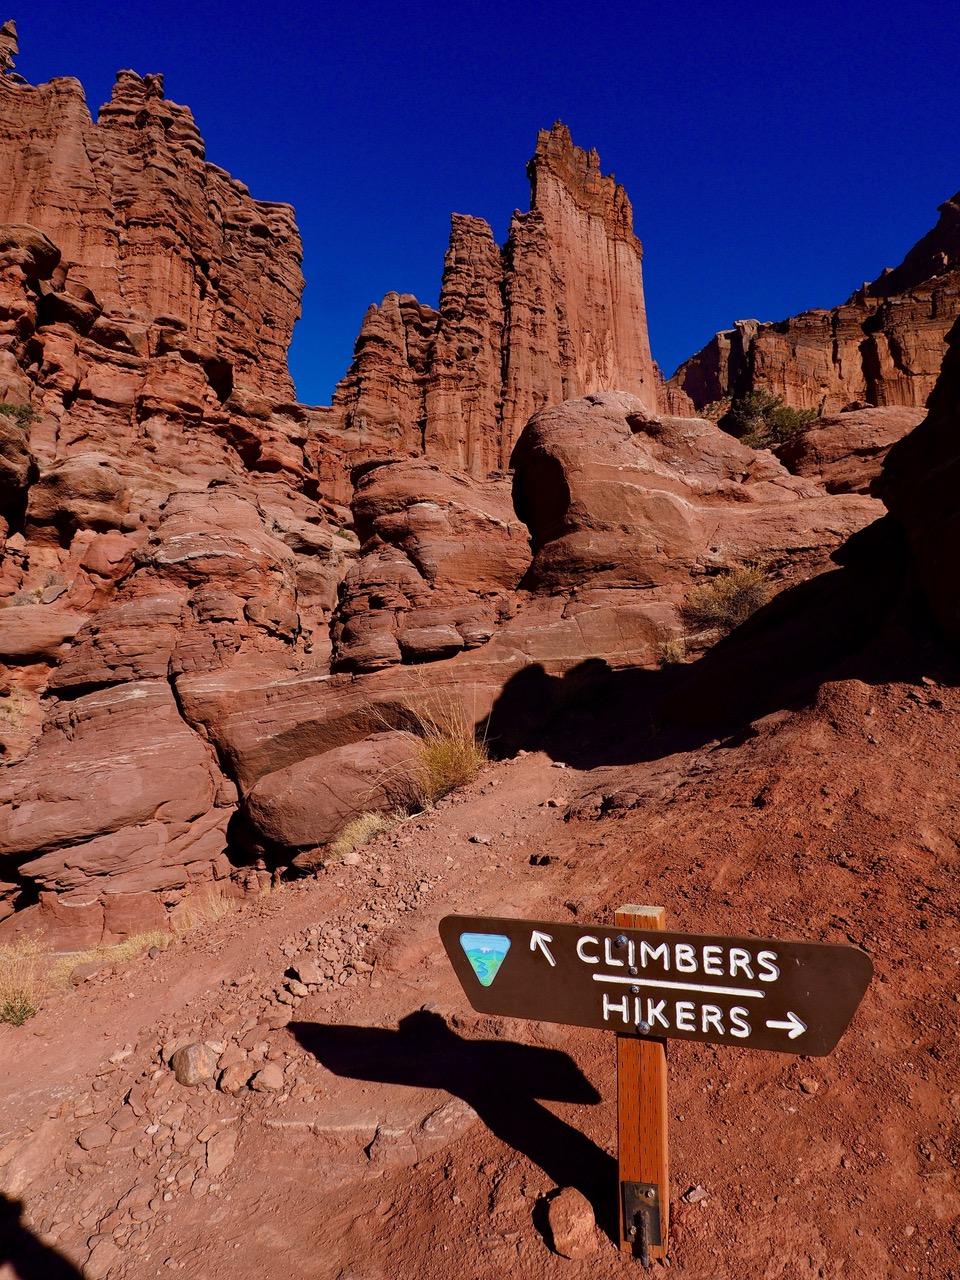 climbers-hikers-sign-PC120031.jpg